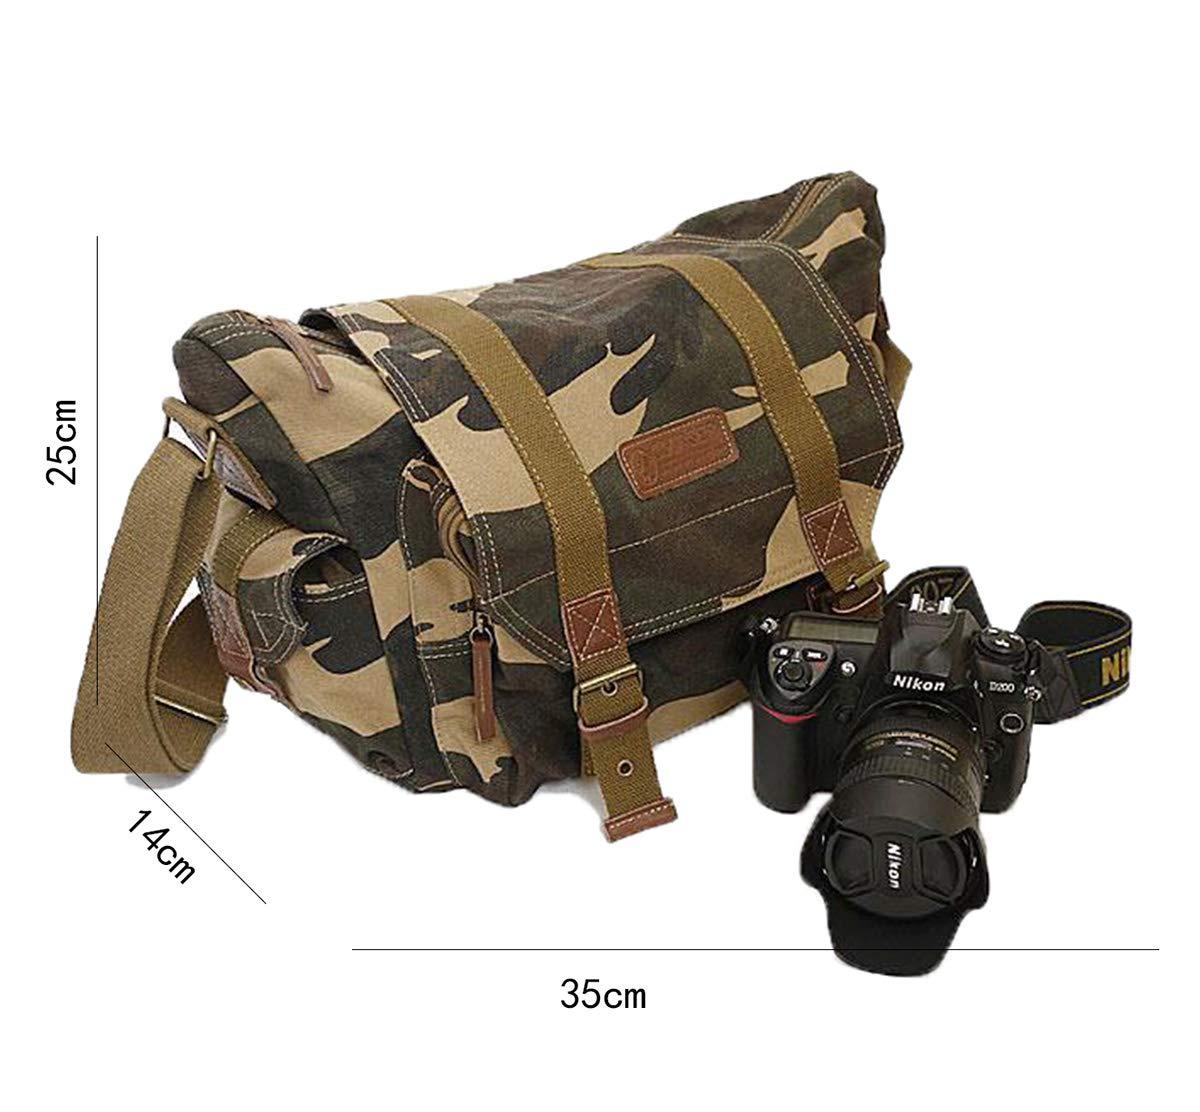 FSPJ-3 Tclothing Camouflage M/ä nner Kameratasche f/ü r Deine SLR-Kamera Kuriertasche f/ü r Photographers Wasserdicht Military H/ü fttasche Canvas Umh/ä ngetasche Dunkelbraun